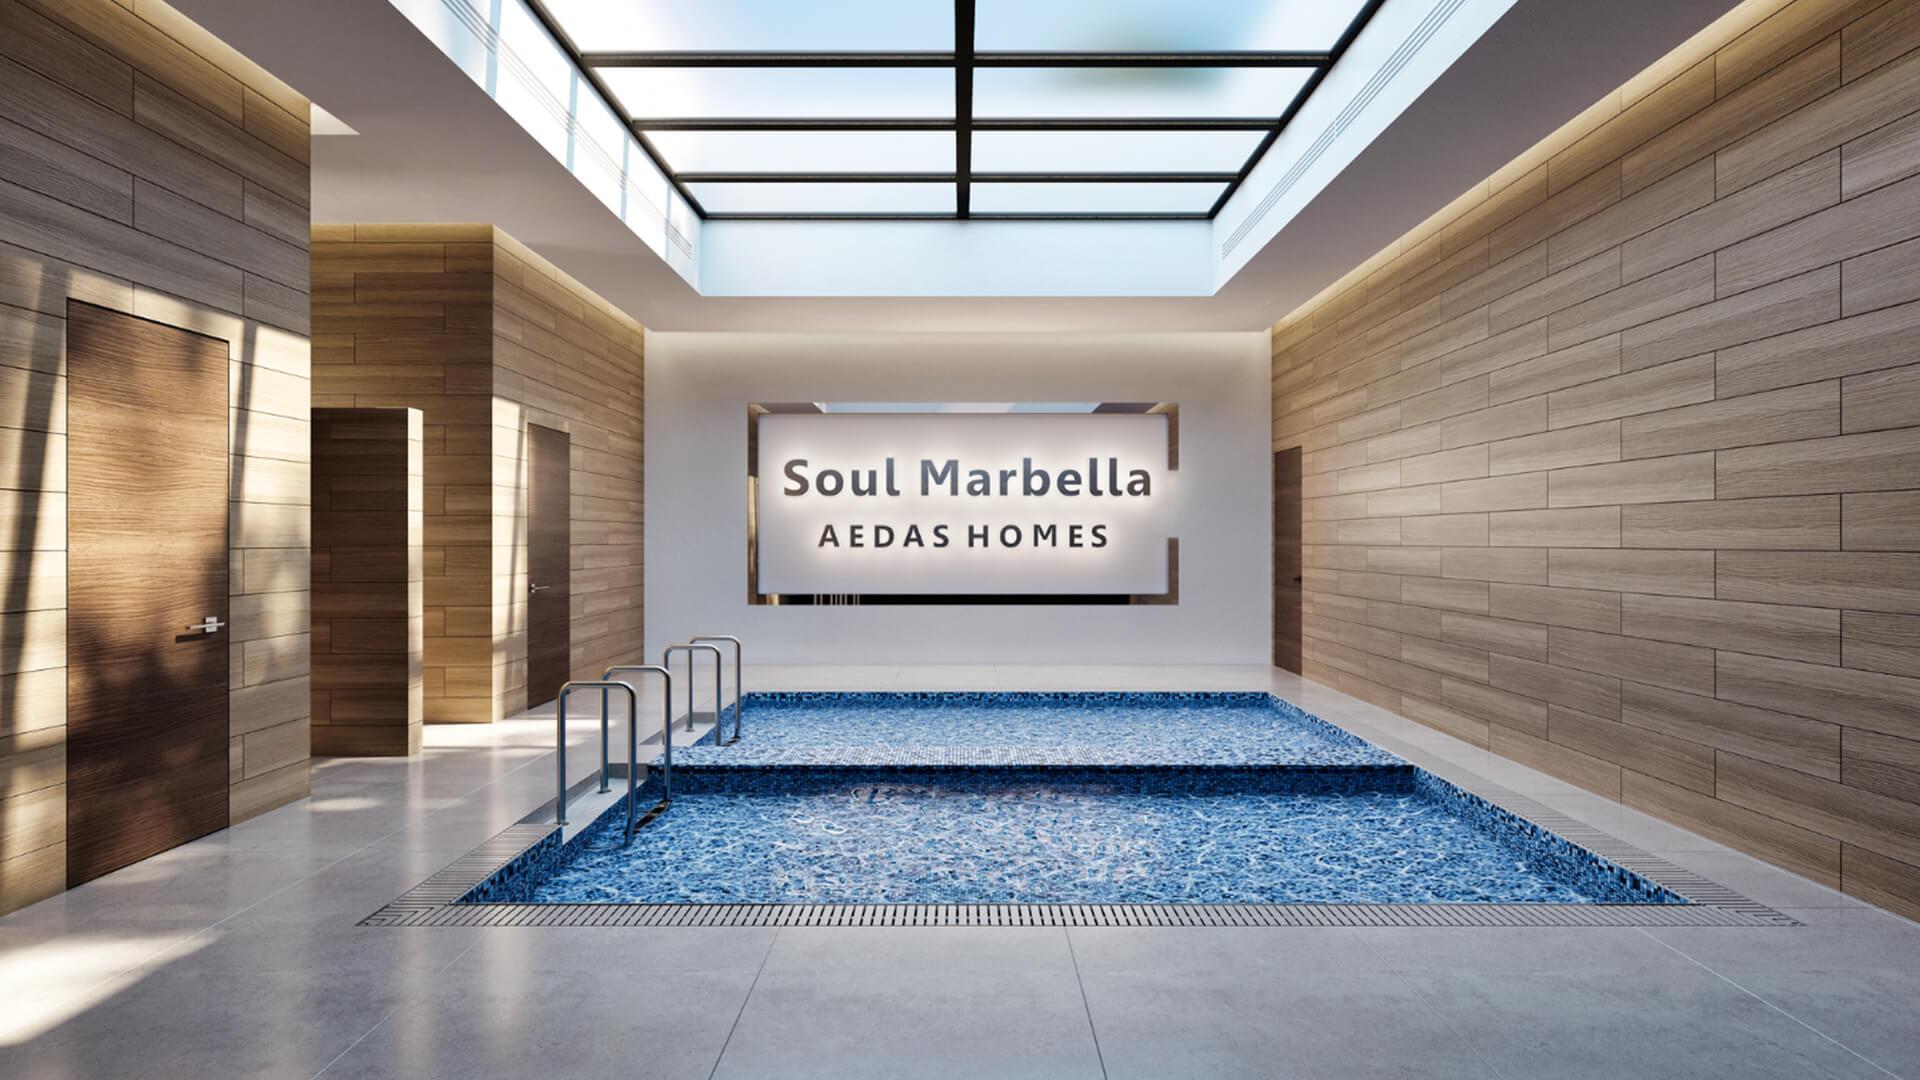 Soul Marbella